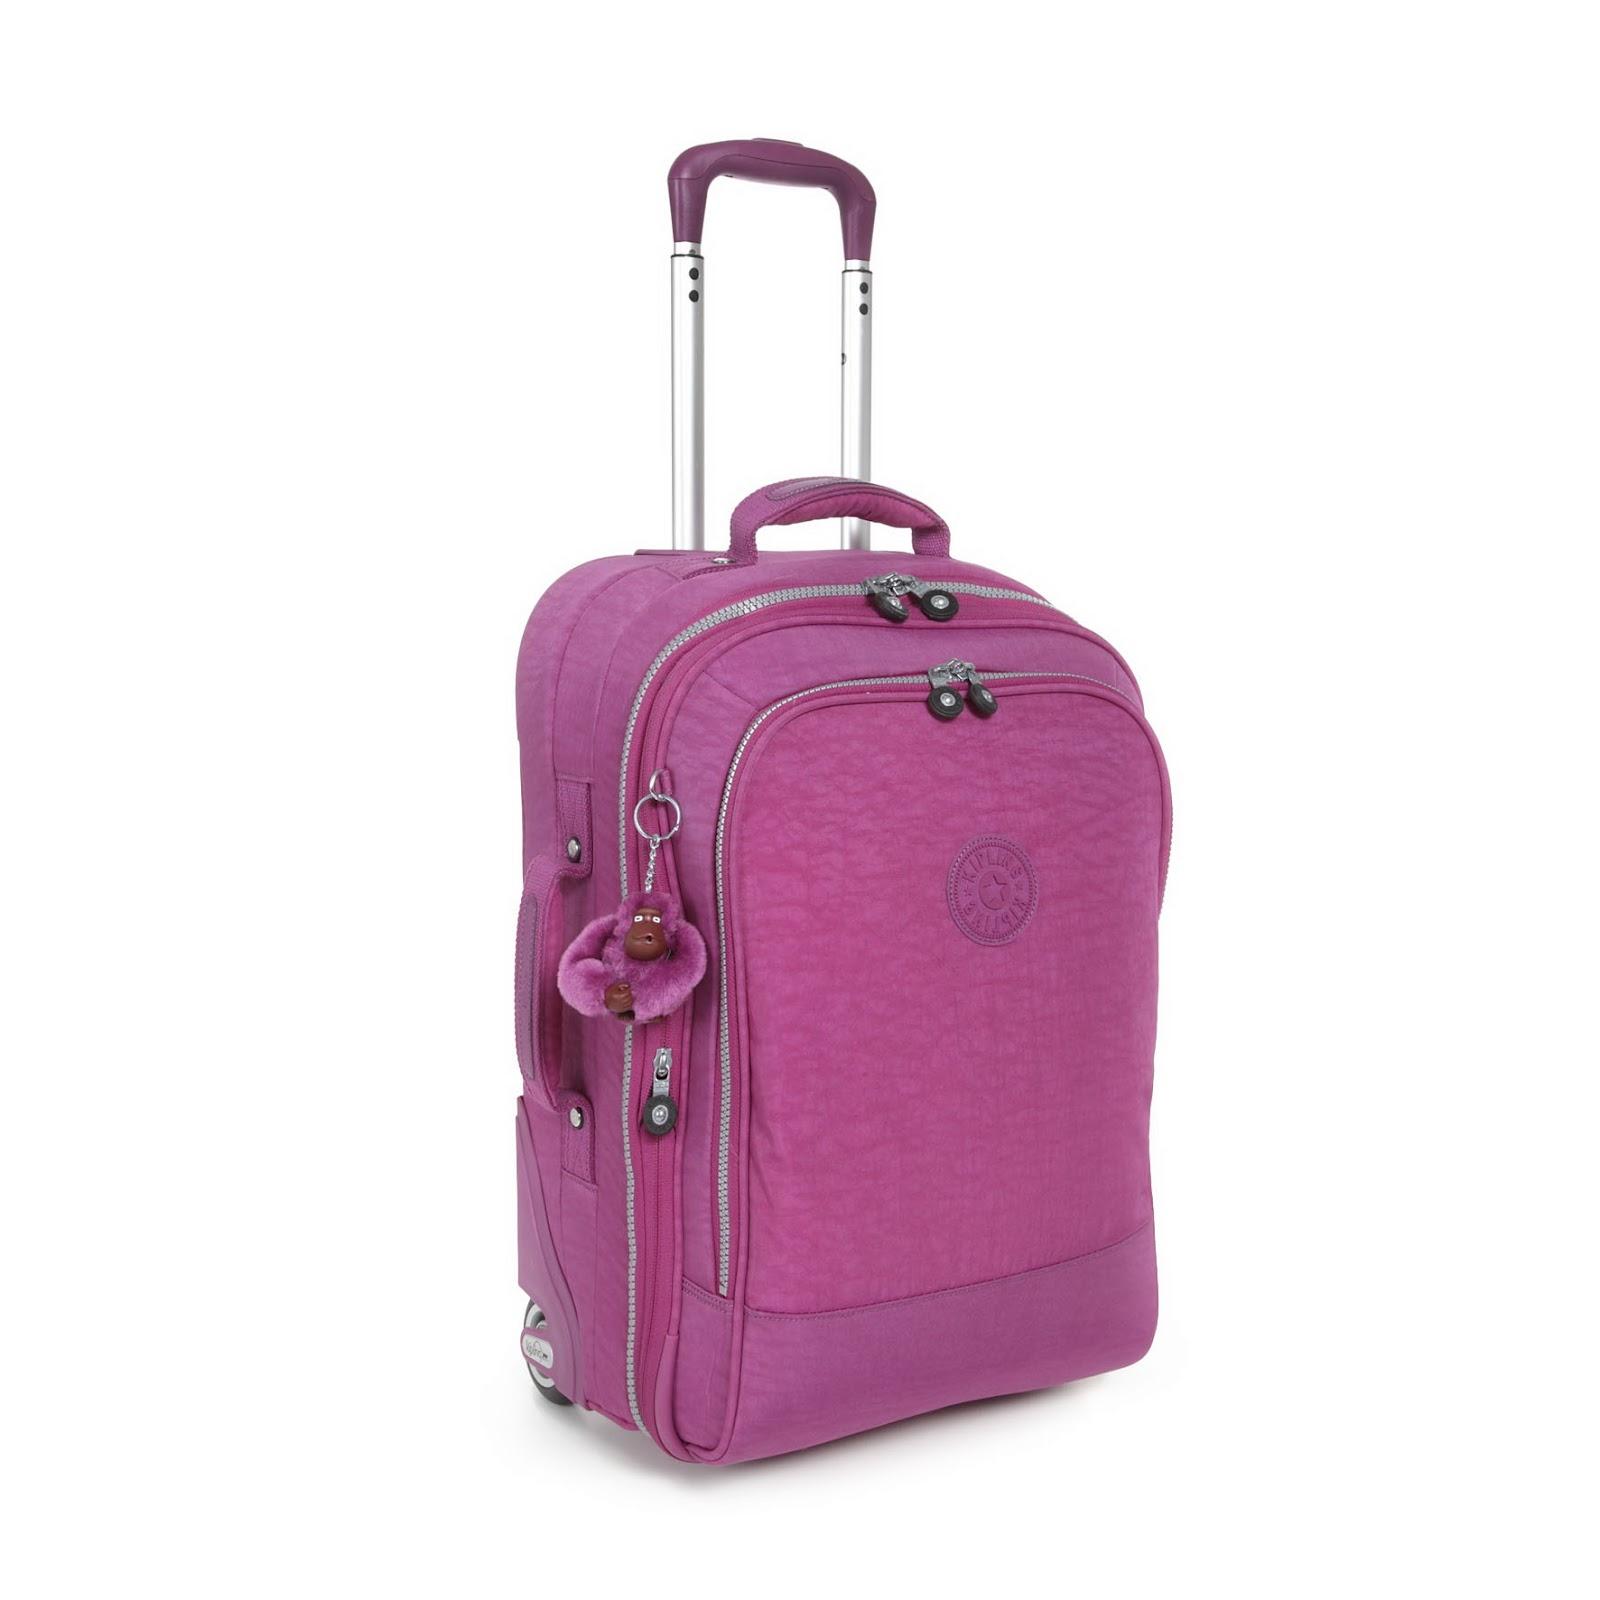 Kipling bags for school with wheels - Kipling Yubin 55 Cabin Size Luggage At 75 Off When You Buy A Kipling